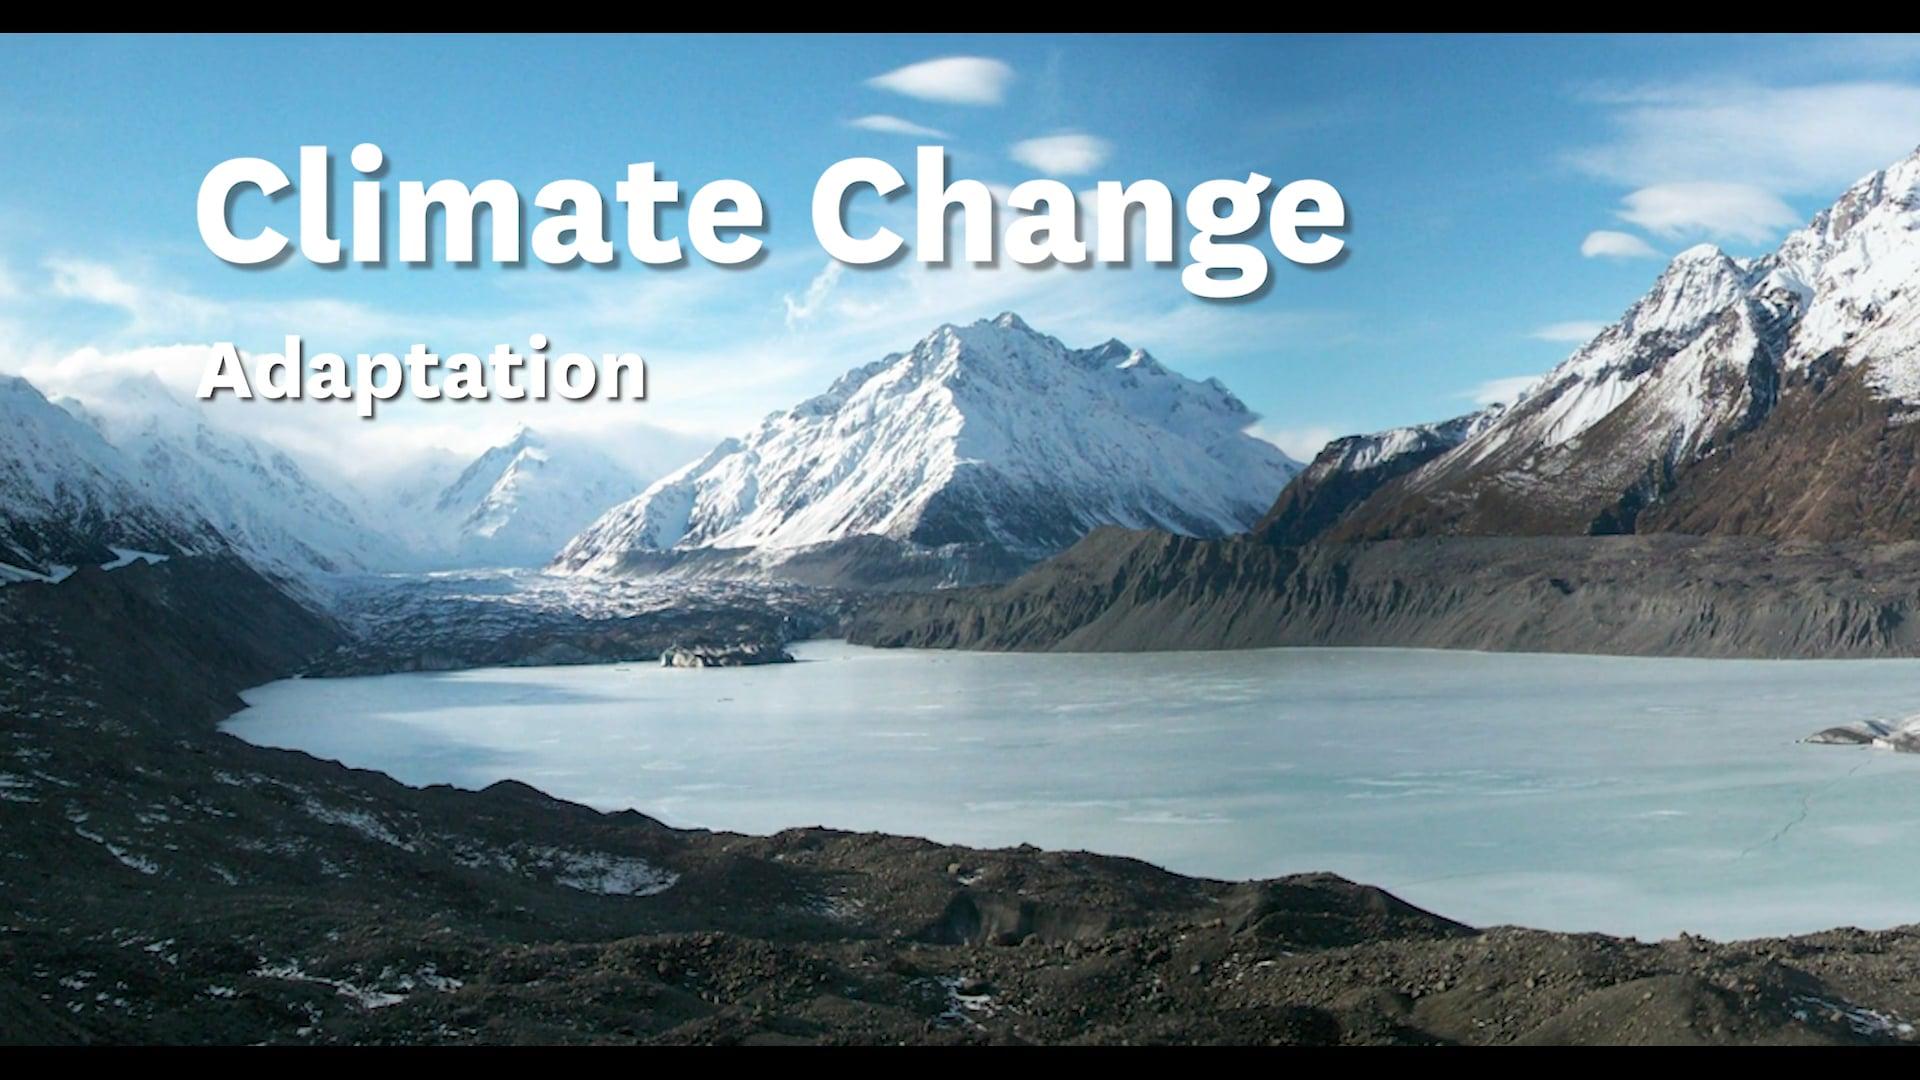 Climate Change - Adaptation